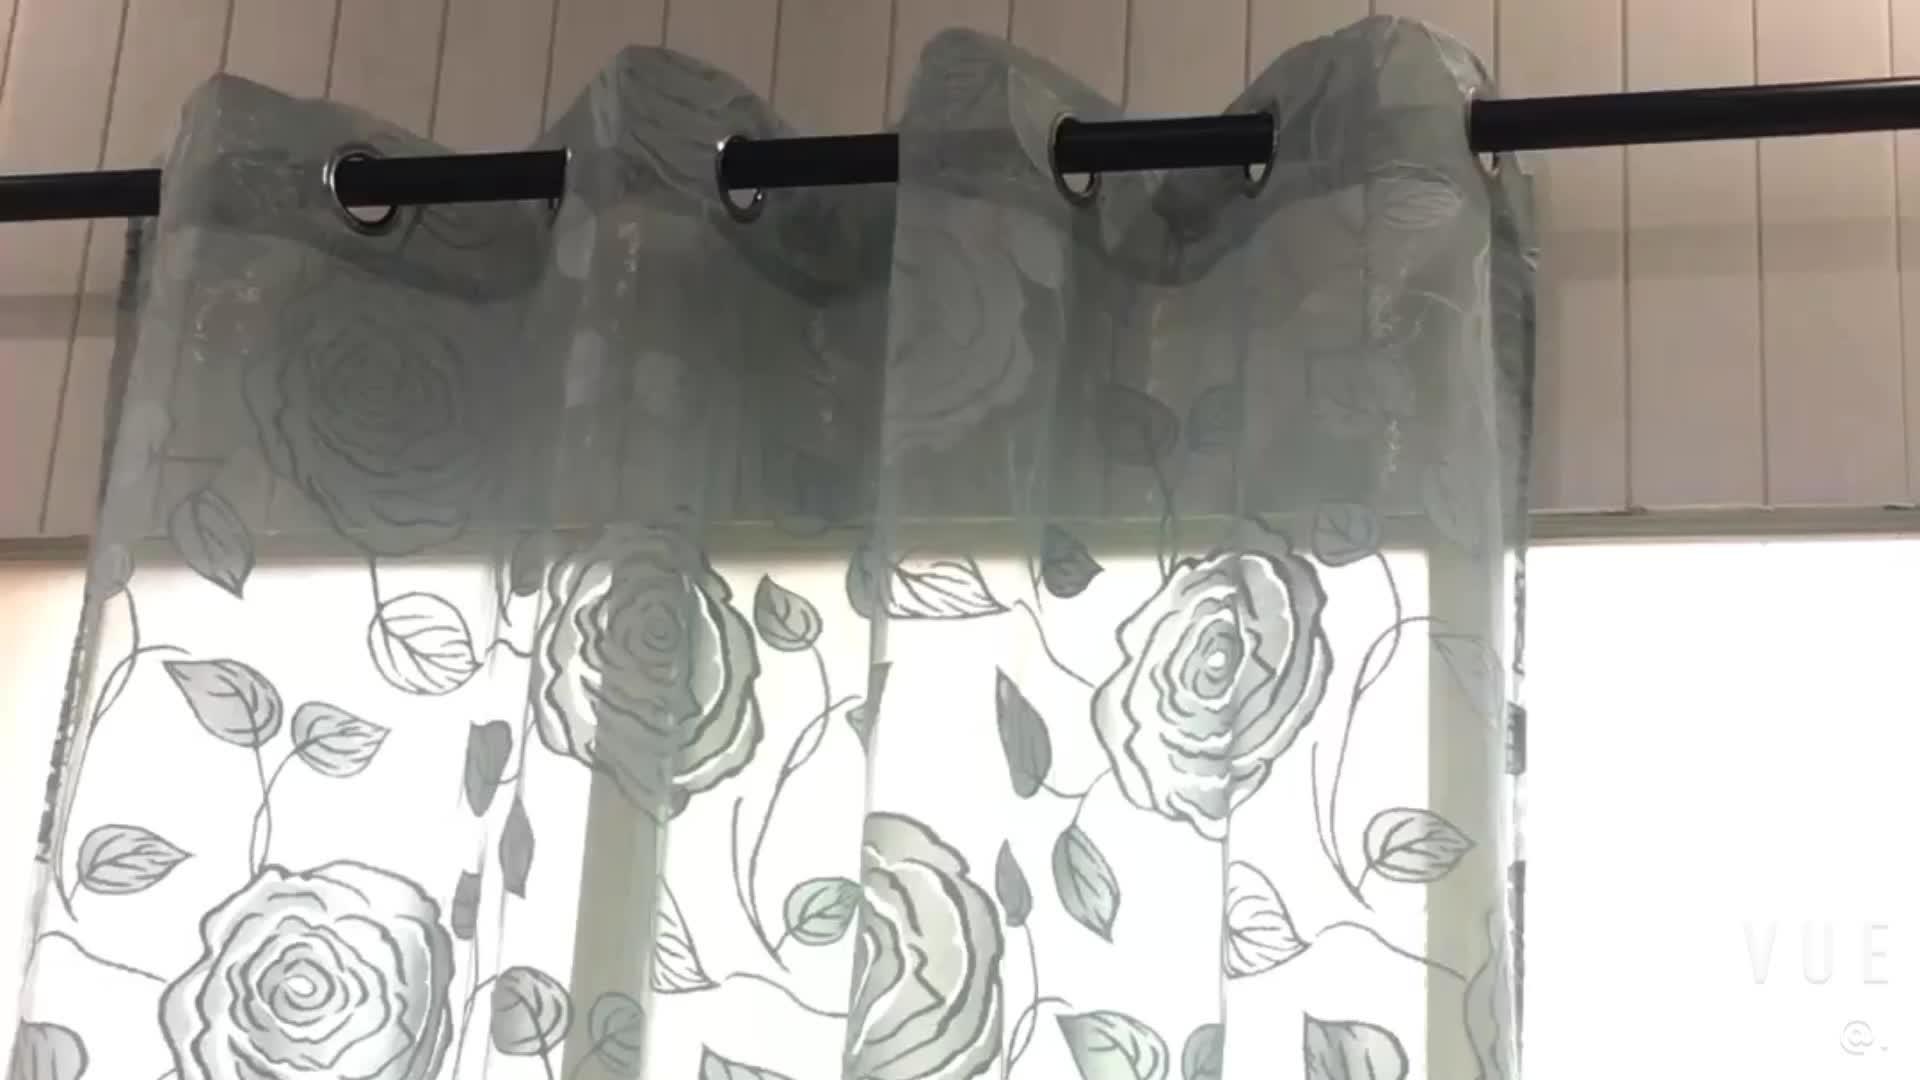 Europa Mewah Blackout 100% Polyester Ruang Tamu Tirai Kain Dekorasi Rumah Bunga Putih Tipis Cortinas Warp Knit/